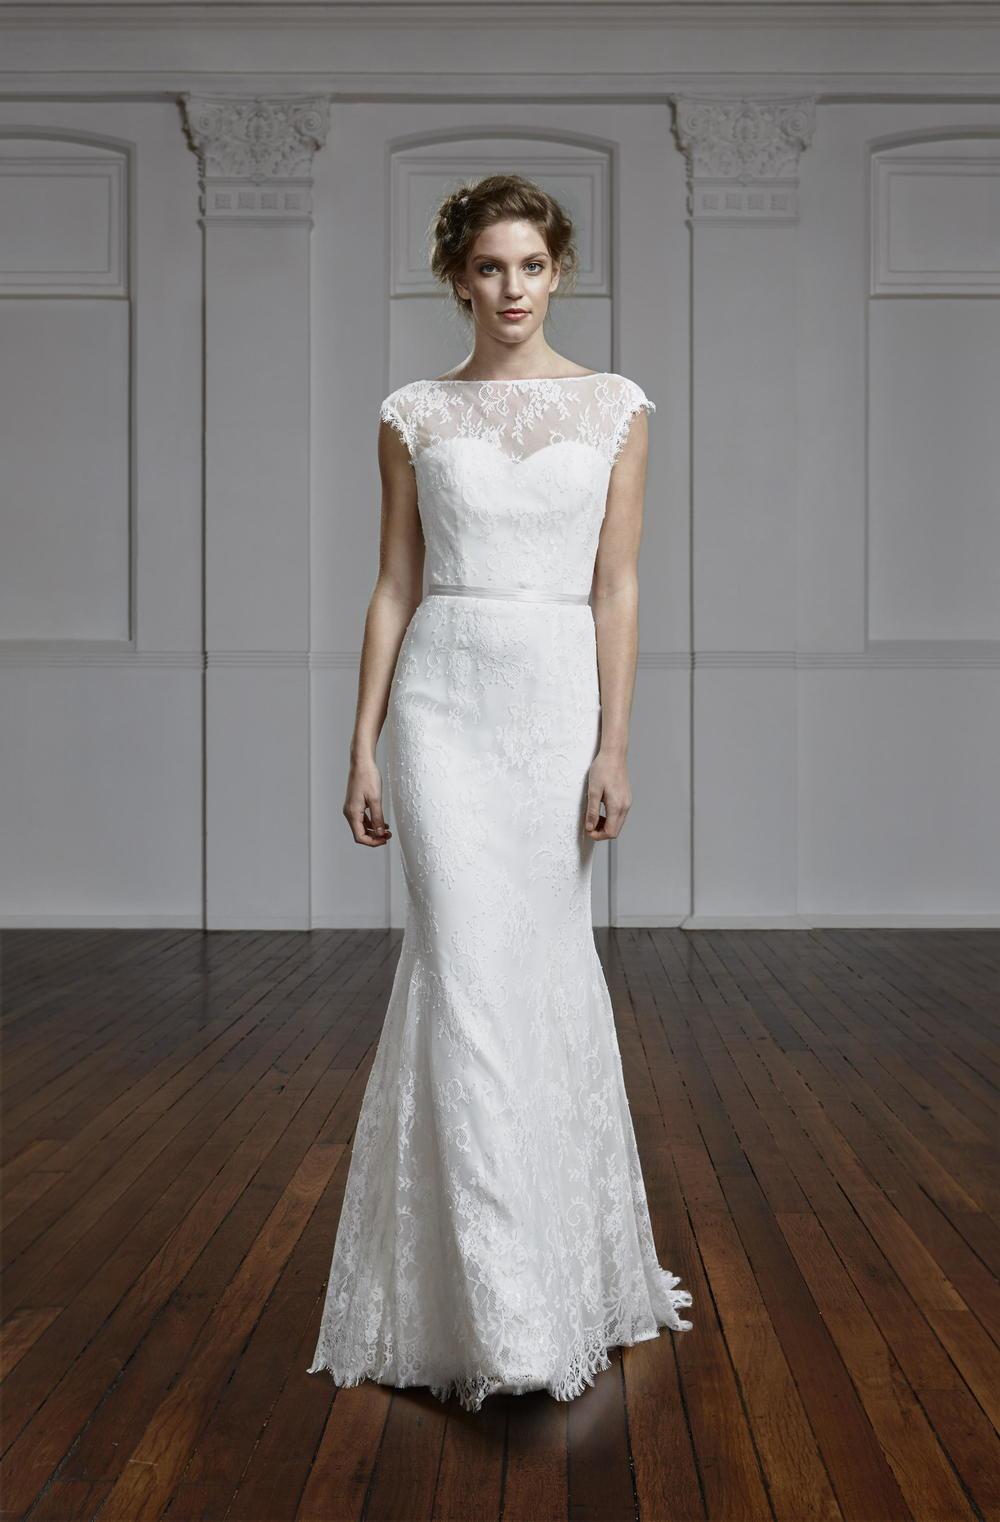 c2a691b465 Delphina-bridal design by Tanya Anic photography by  ©GrantSparkesCarroll 194 a.jpg